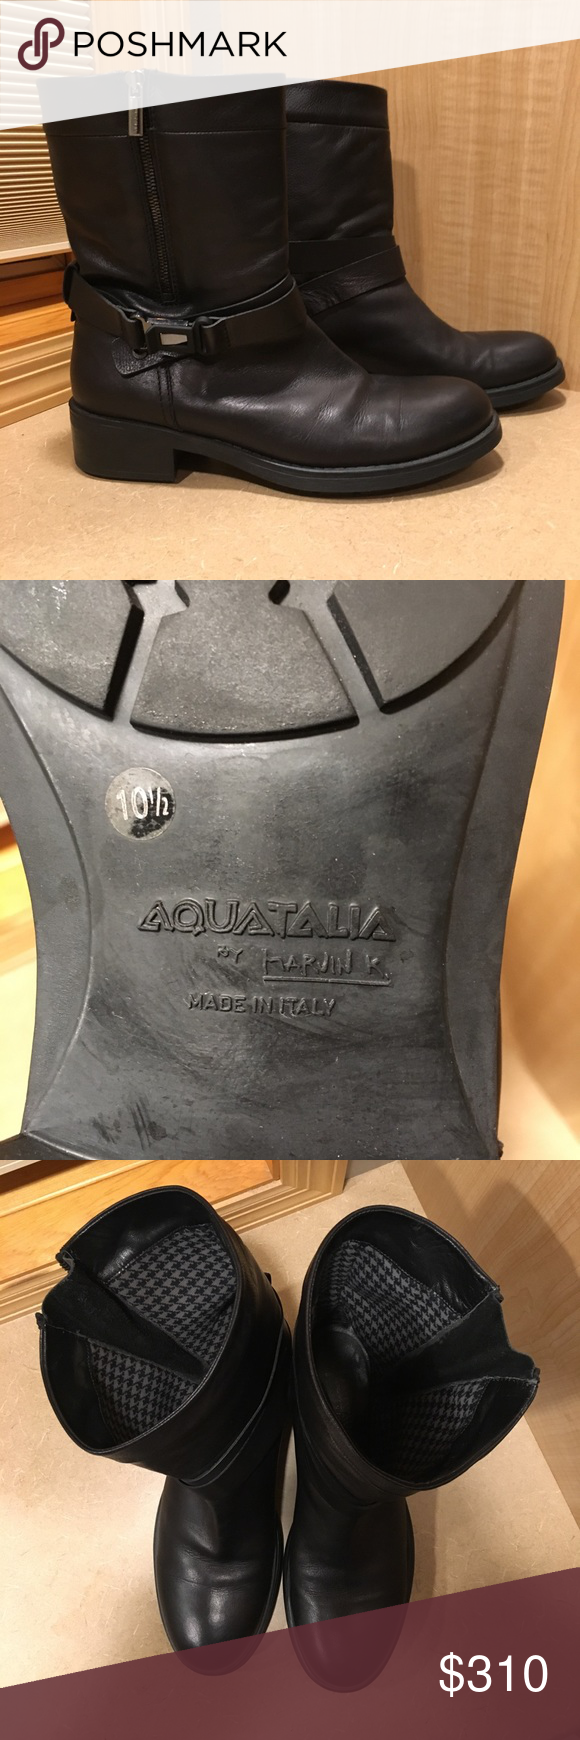 c02b8dceb084 Aquatalia Sami Weatherproof Moto Ankle Boot Aquatalia grained leather  mid-calf boot. Approx.